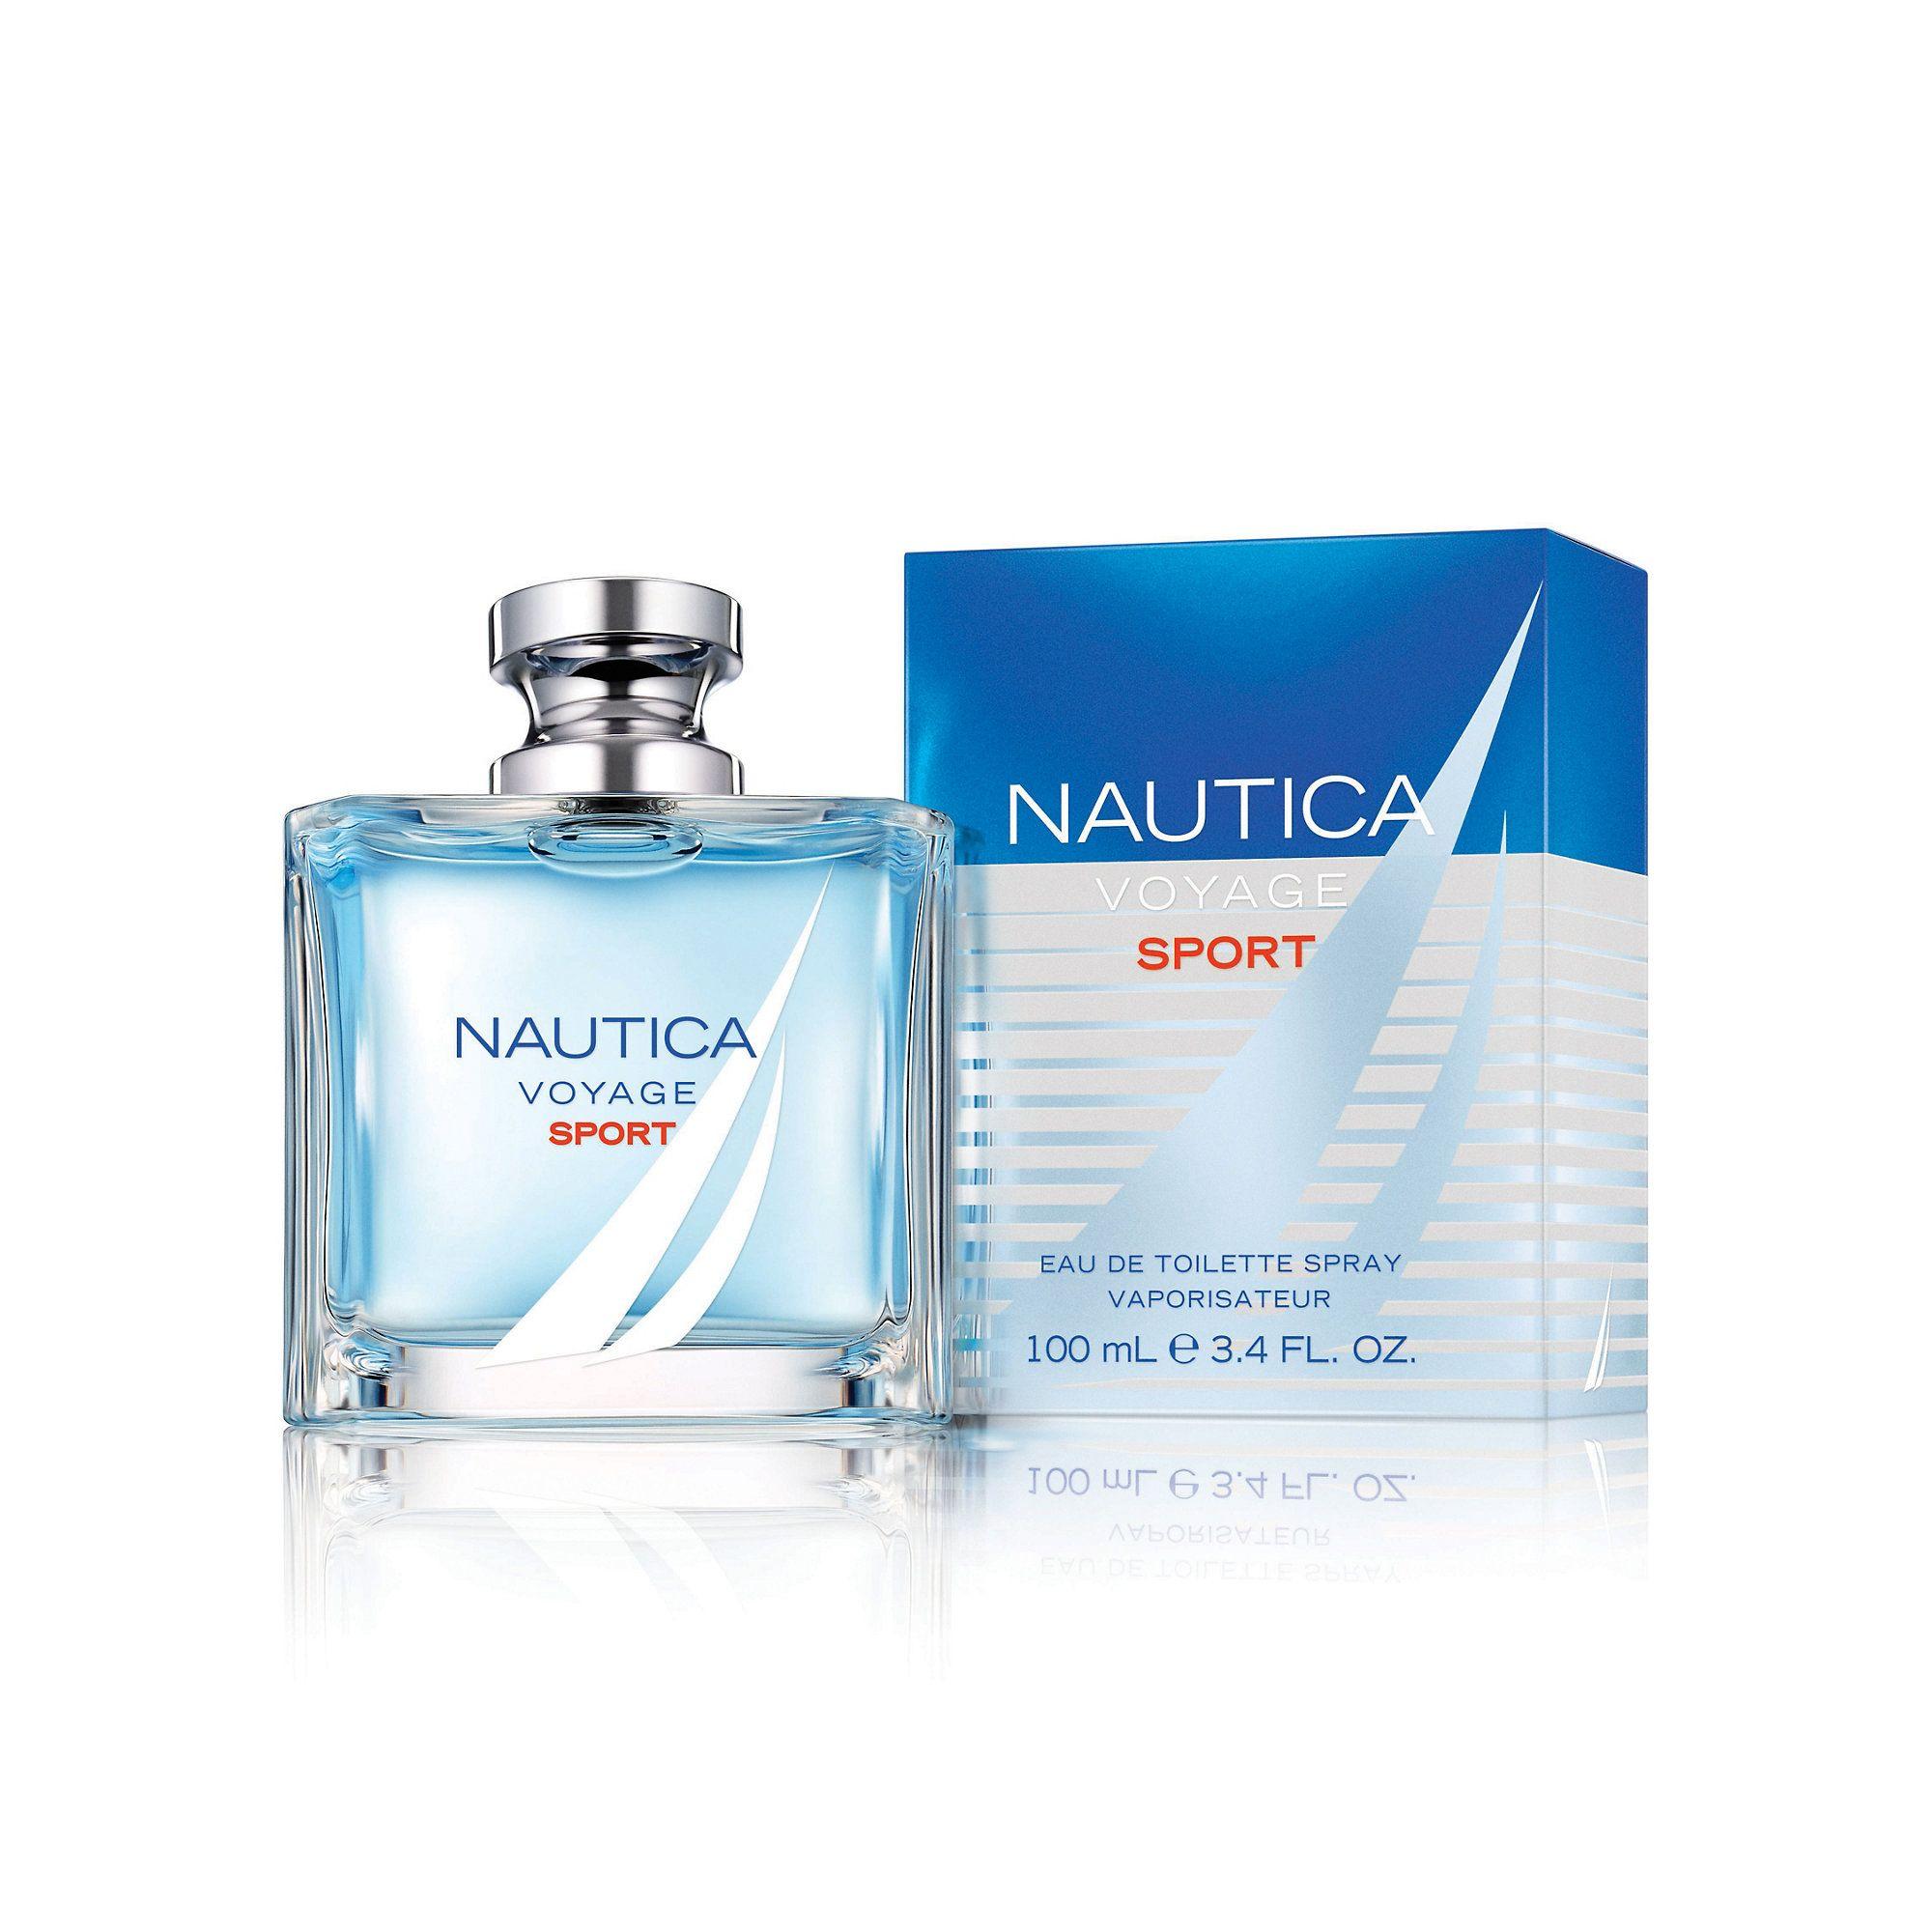 Nautica Voyage Sport | Nautica voyage, Nautica fragrance